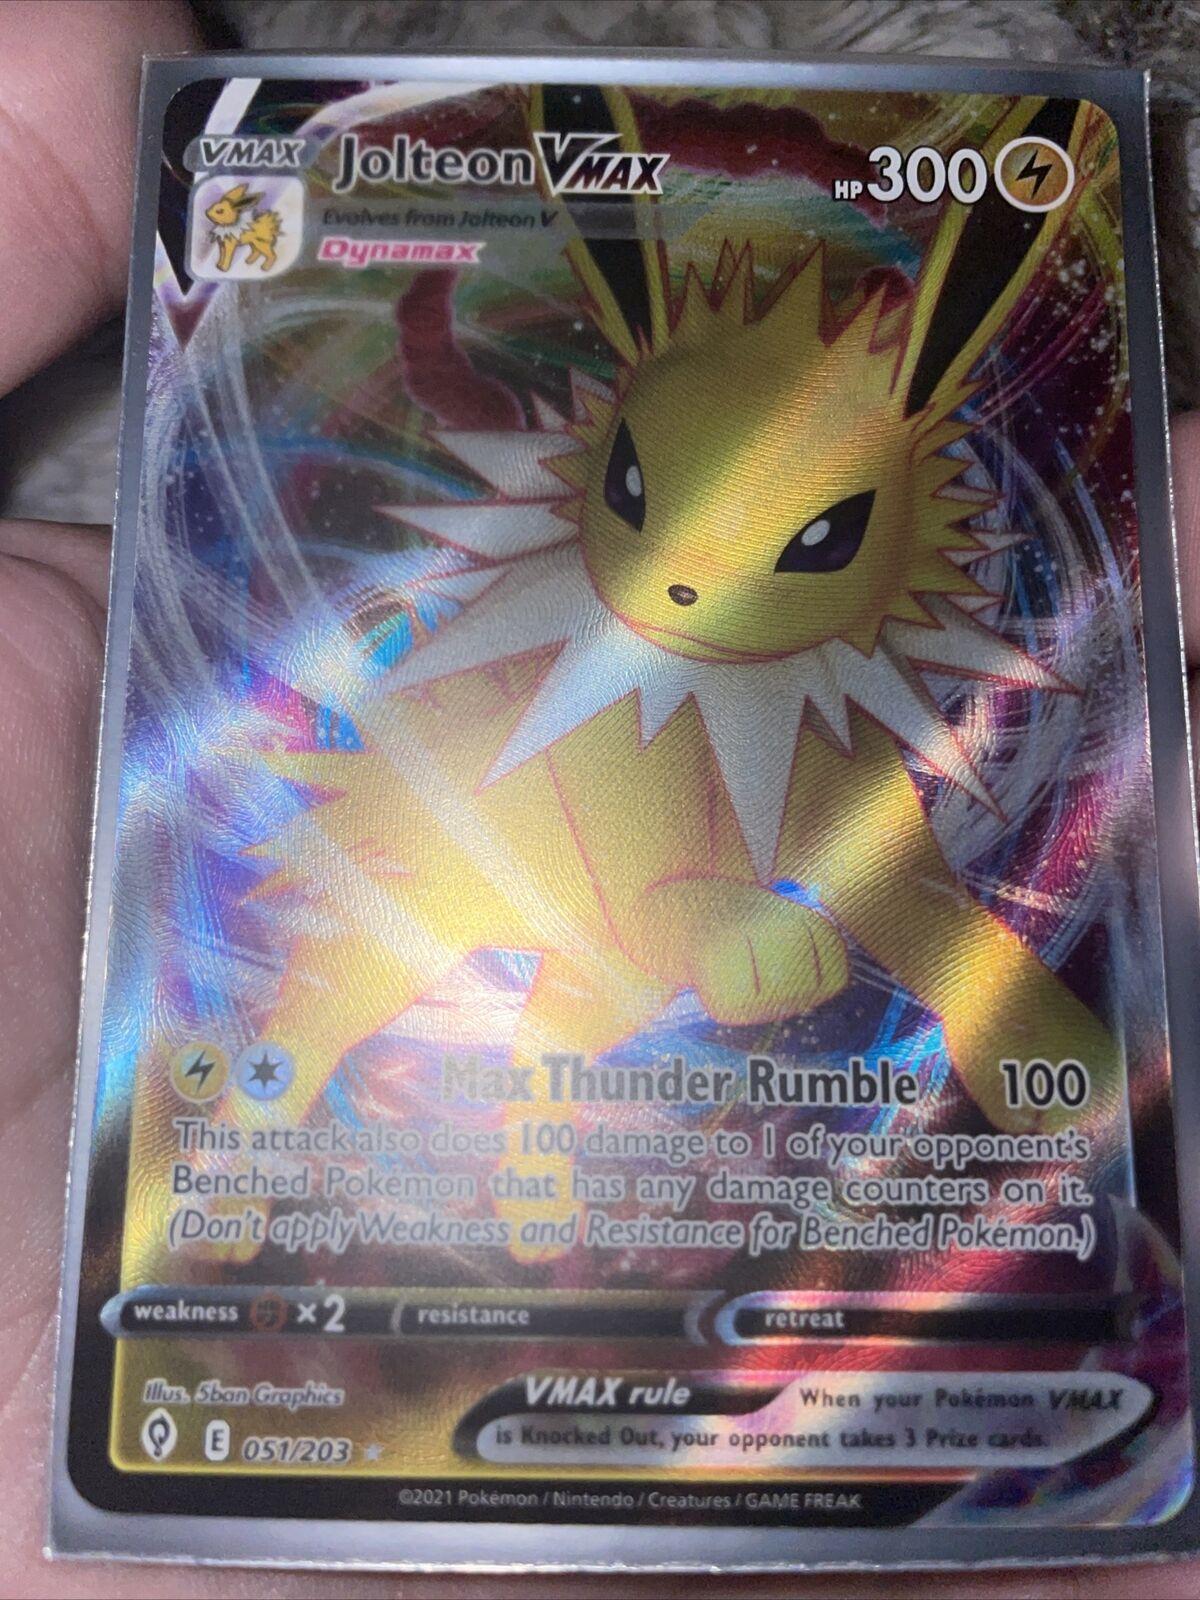 Pokemon TCG Jolteon VMAX Full Art Ultra Rare 051/203 Evolving Skies NM/M